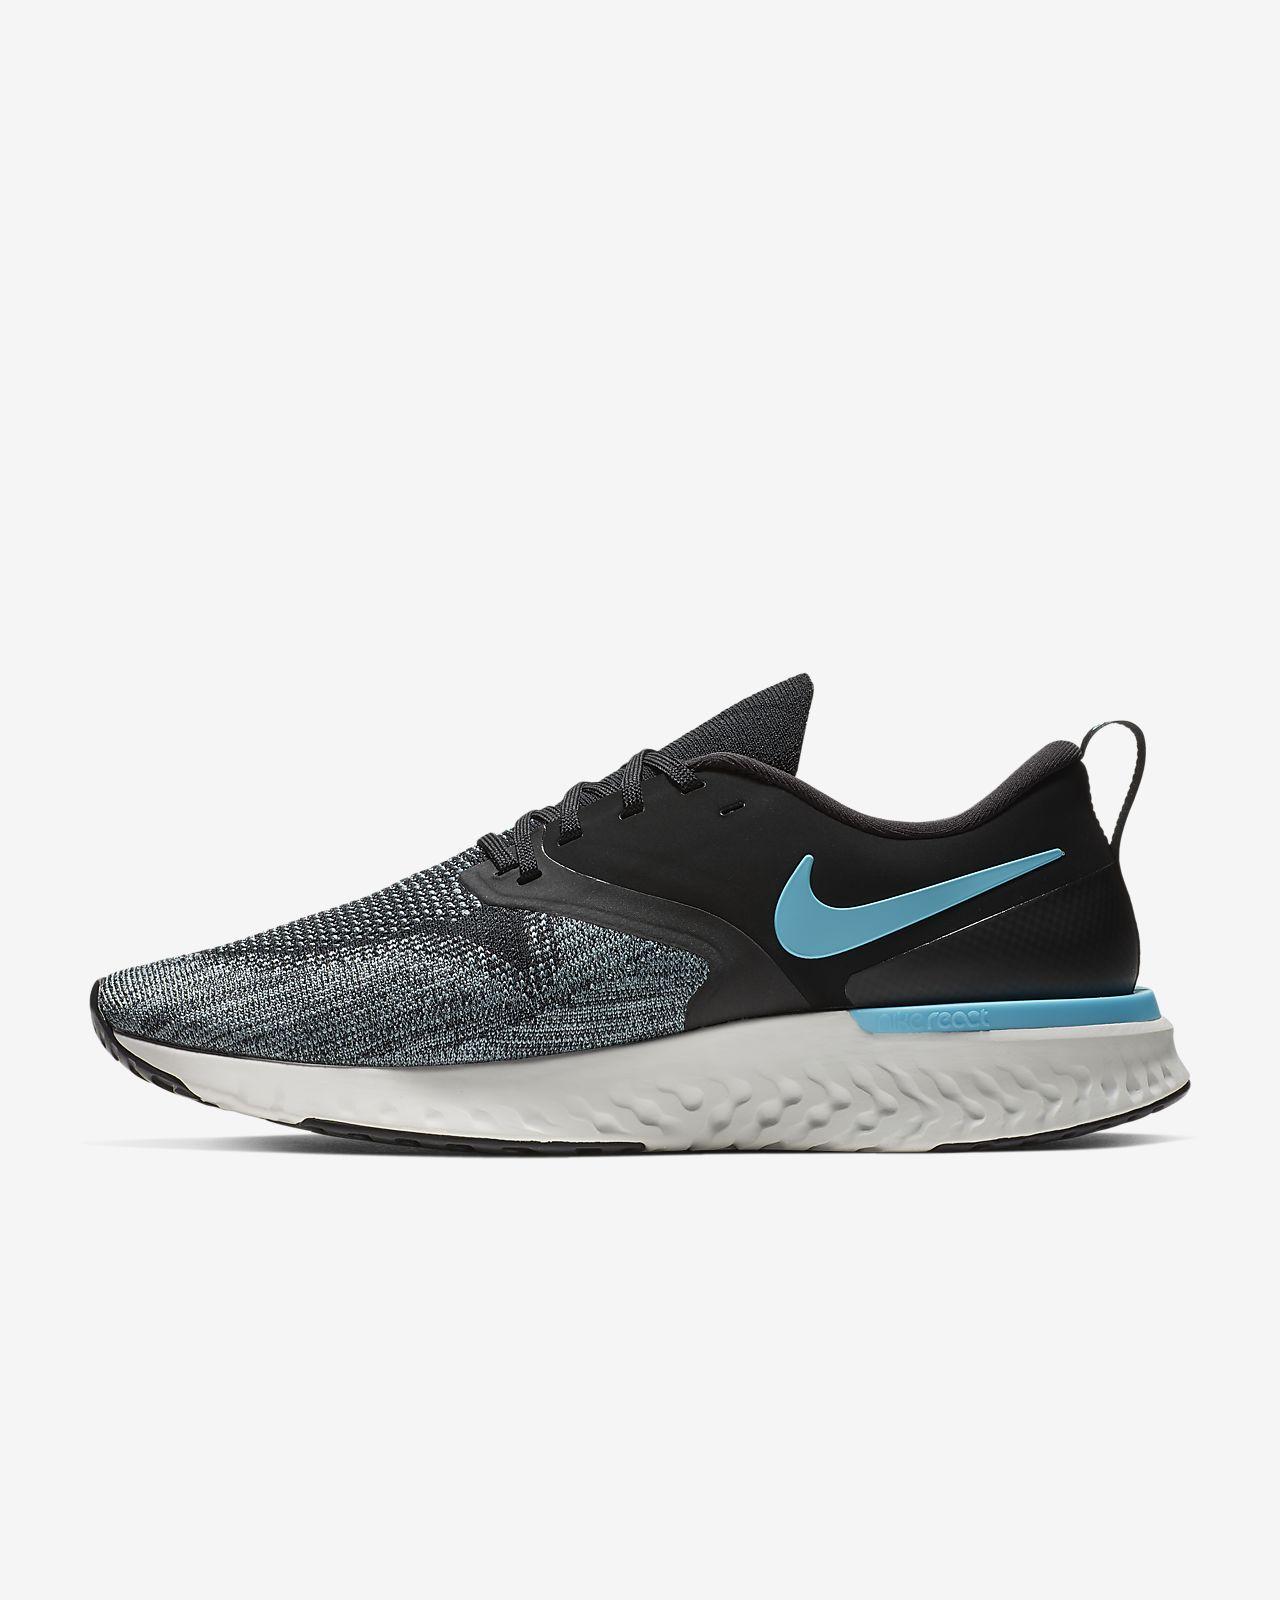 brand new f1620 754d2 Calzado de running para hombre Nike Odyssey React Flyknit 2